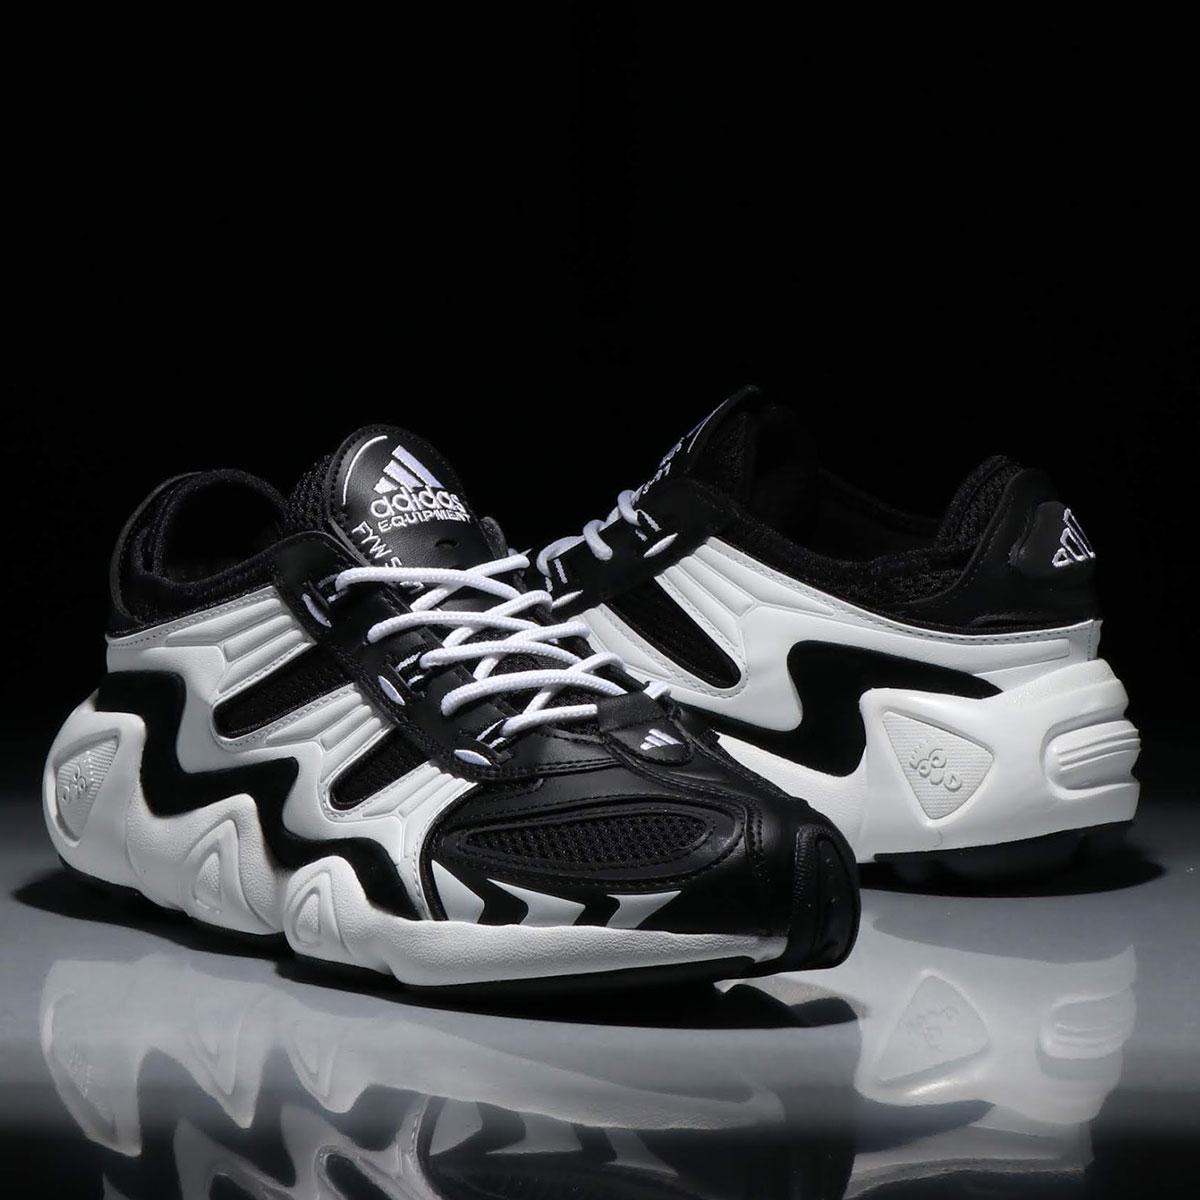 adidas FYW S-97 (アディダス FYW S-97)CORE BLACK/CRYSTAL WHITE/FTWR WHITE【メンズ スニーカー】19SS-I